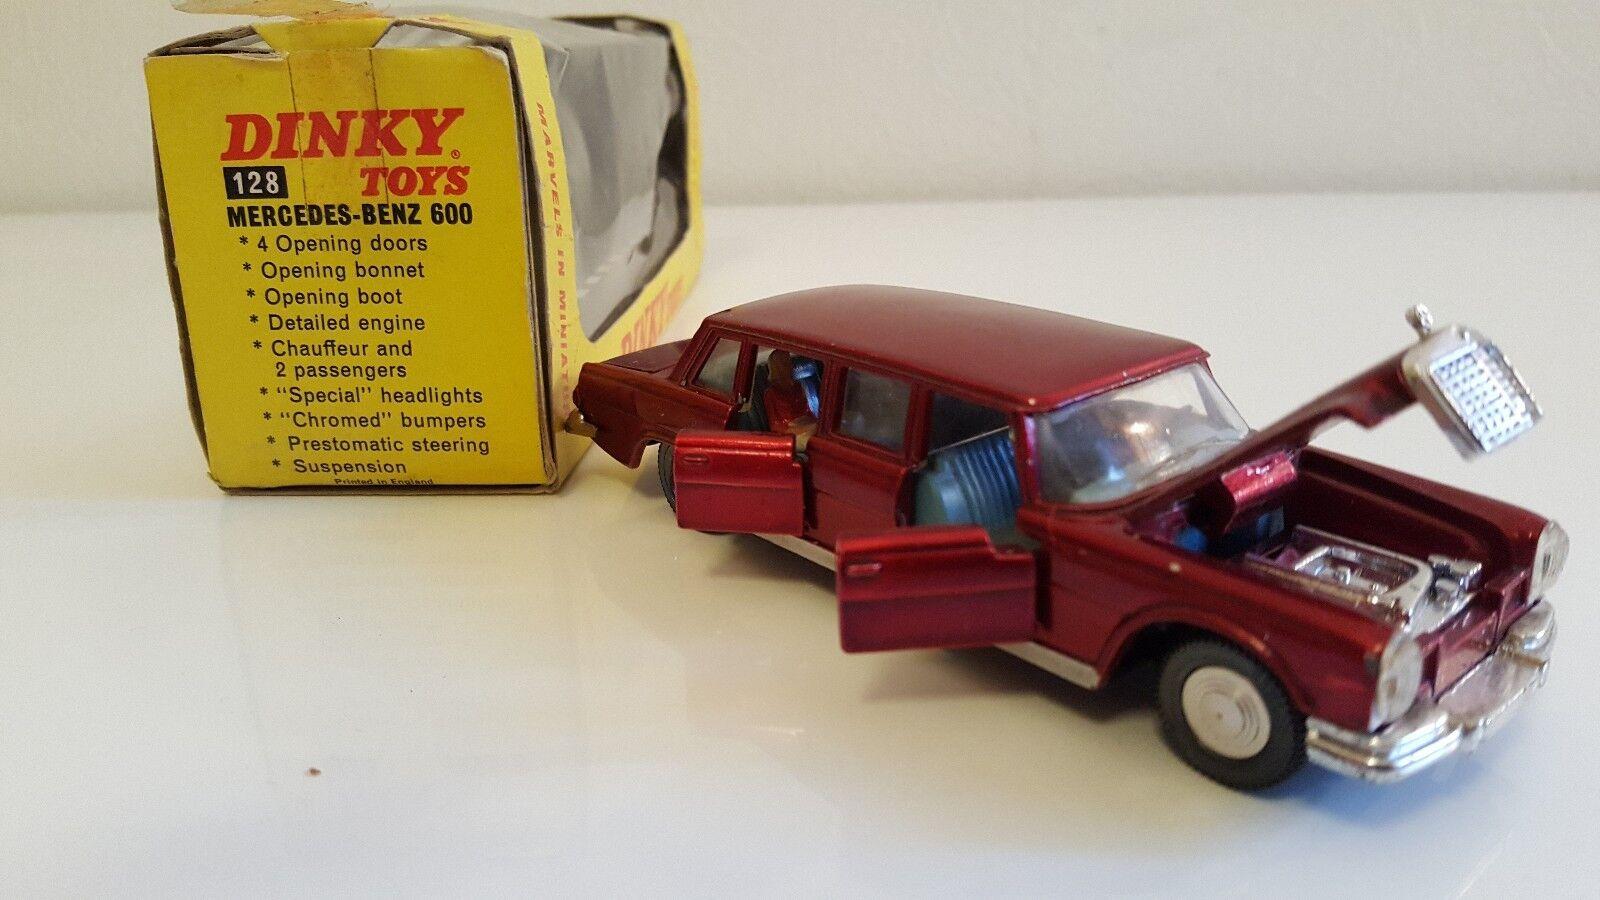 Dinky toys - 128-mercedes 600 bordeaux blueee interior + original box export